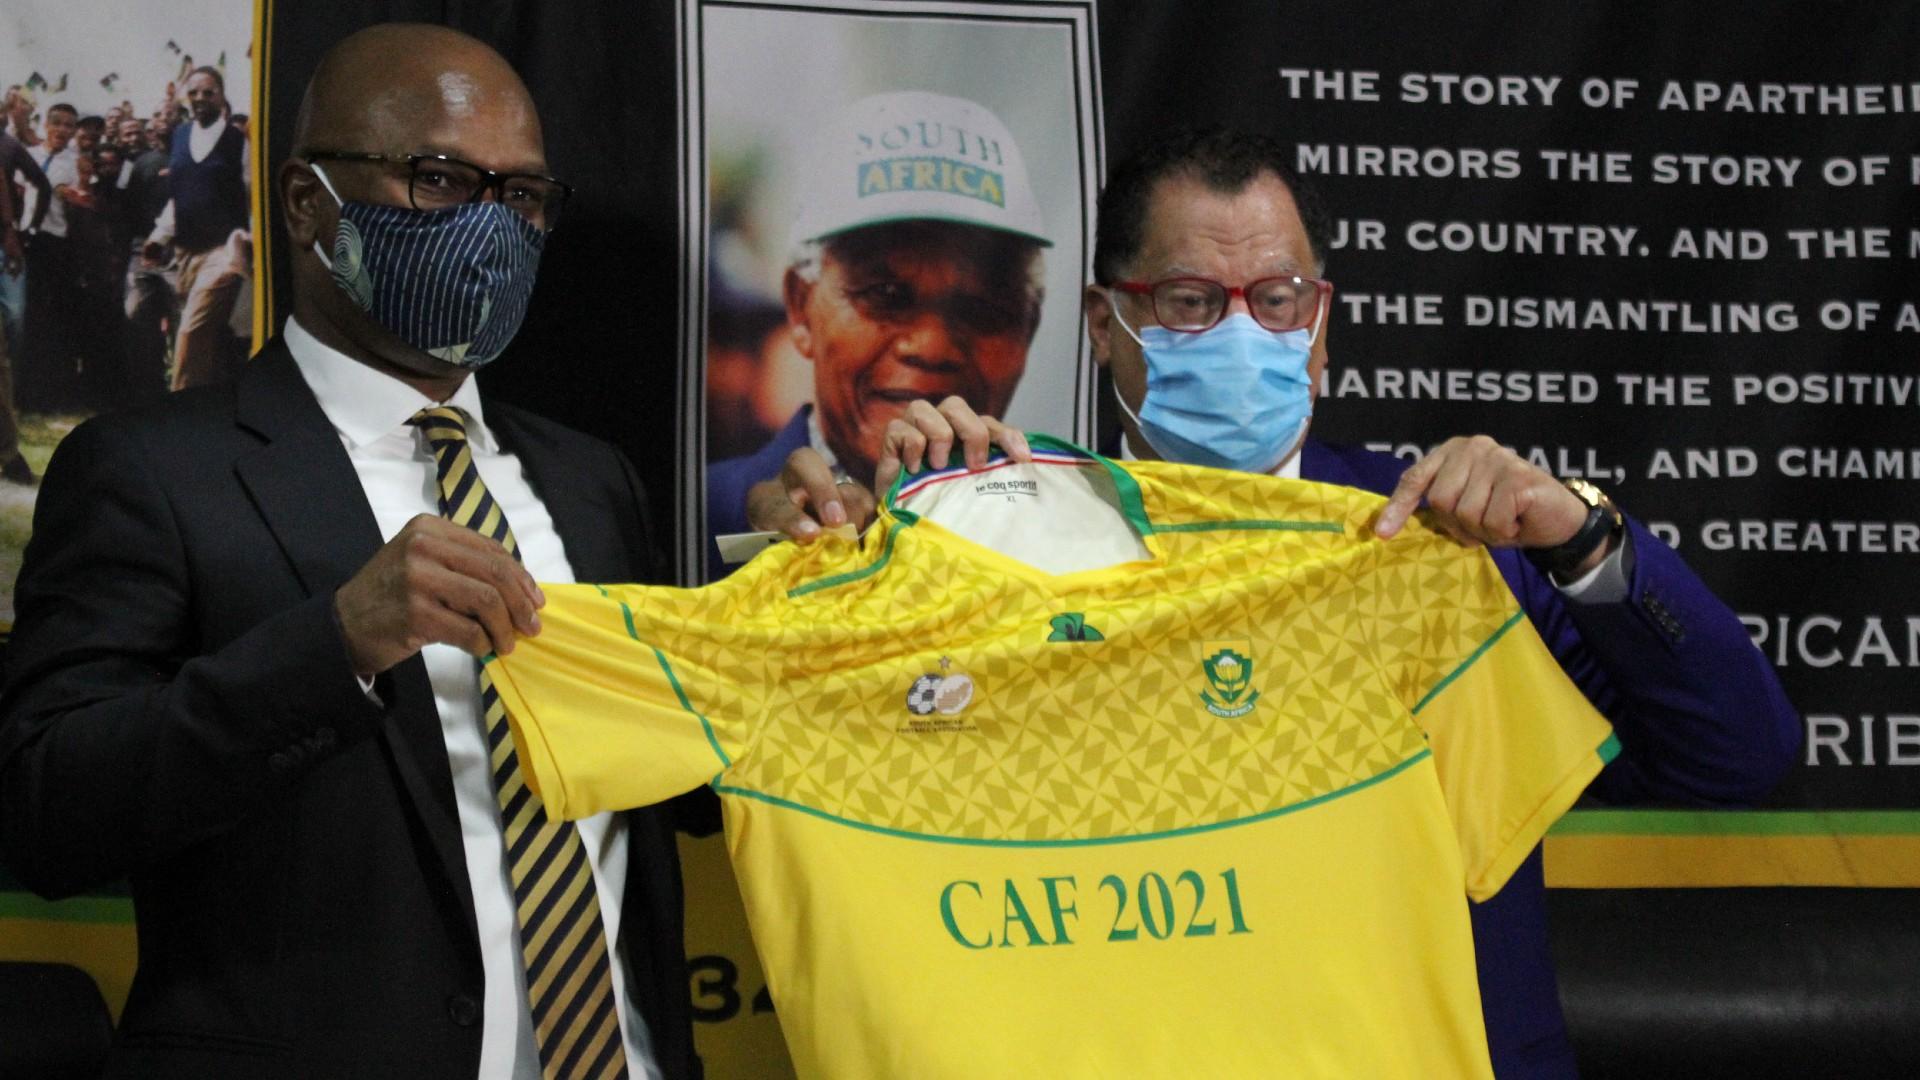 Why Mamelodi Sundowns president Motsepe is the right man to lead Caf – Safa boss Jordaan